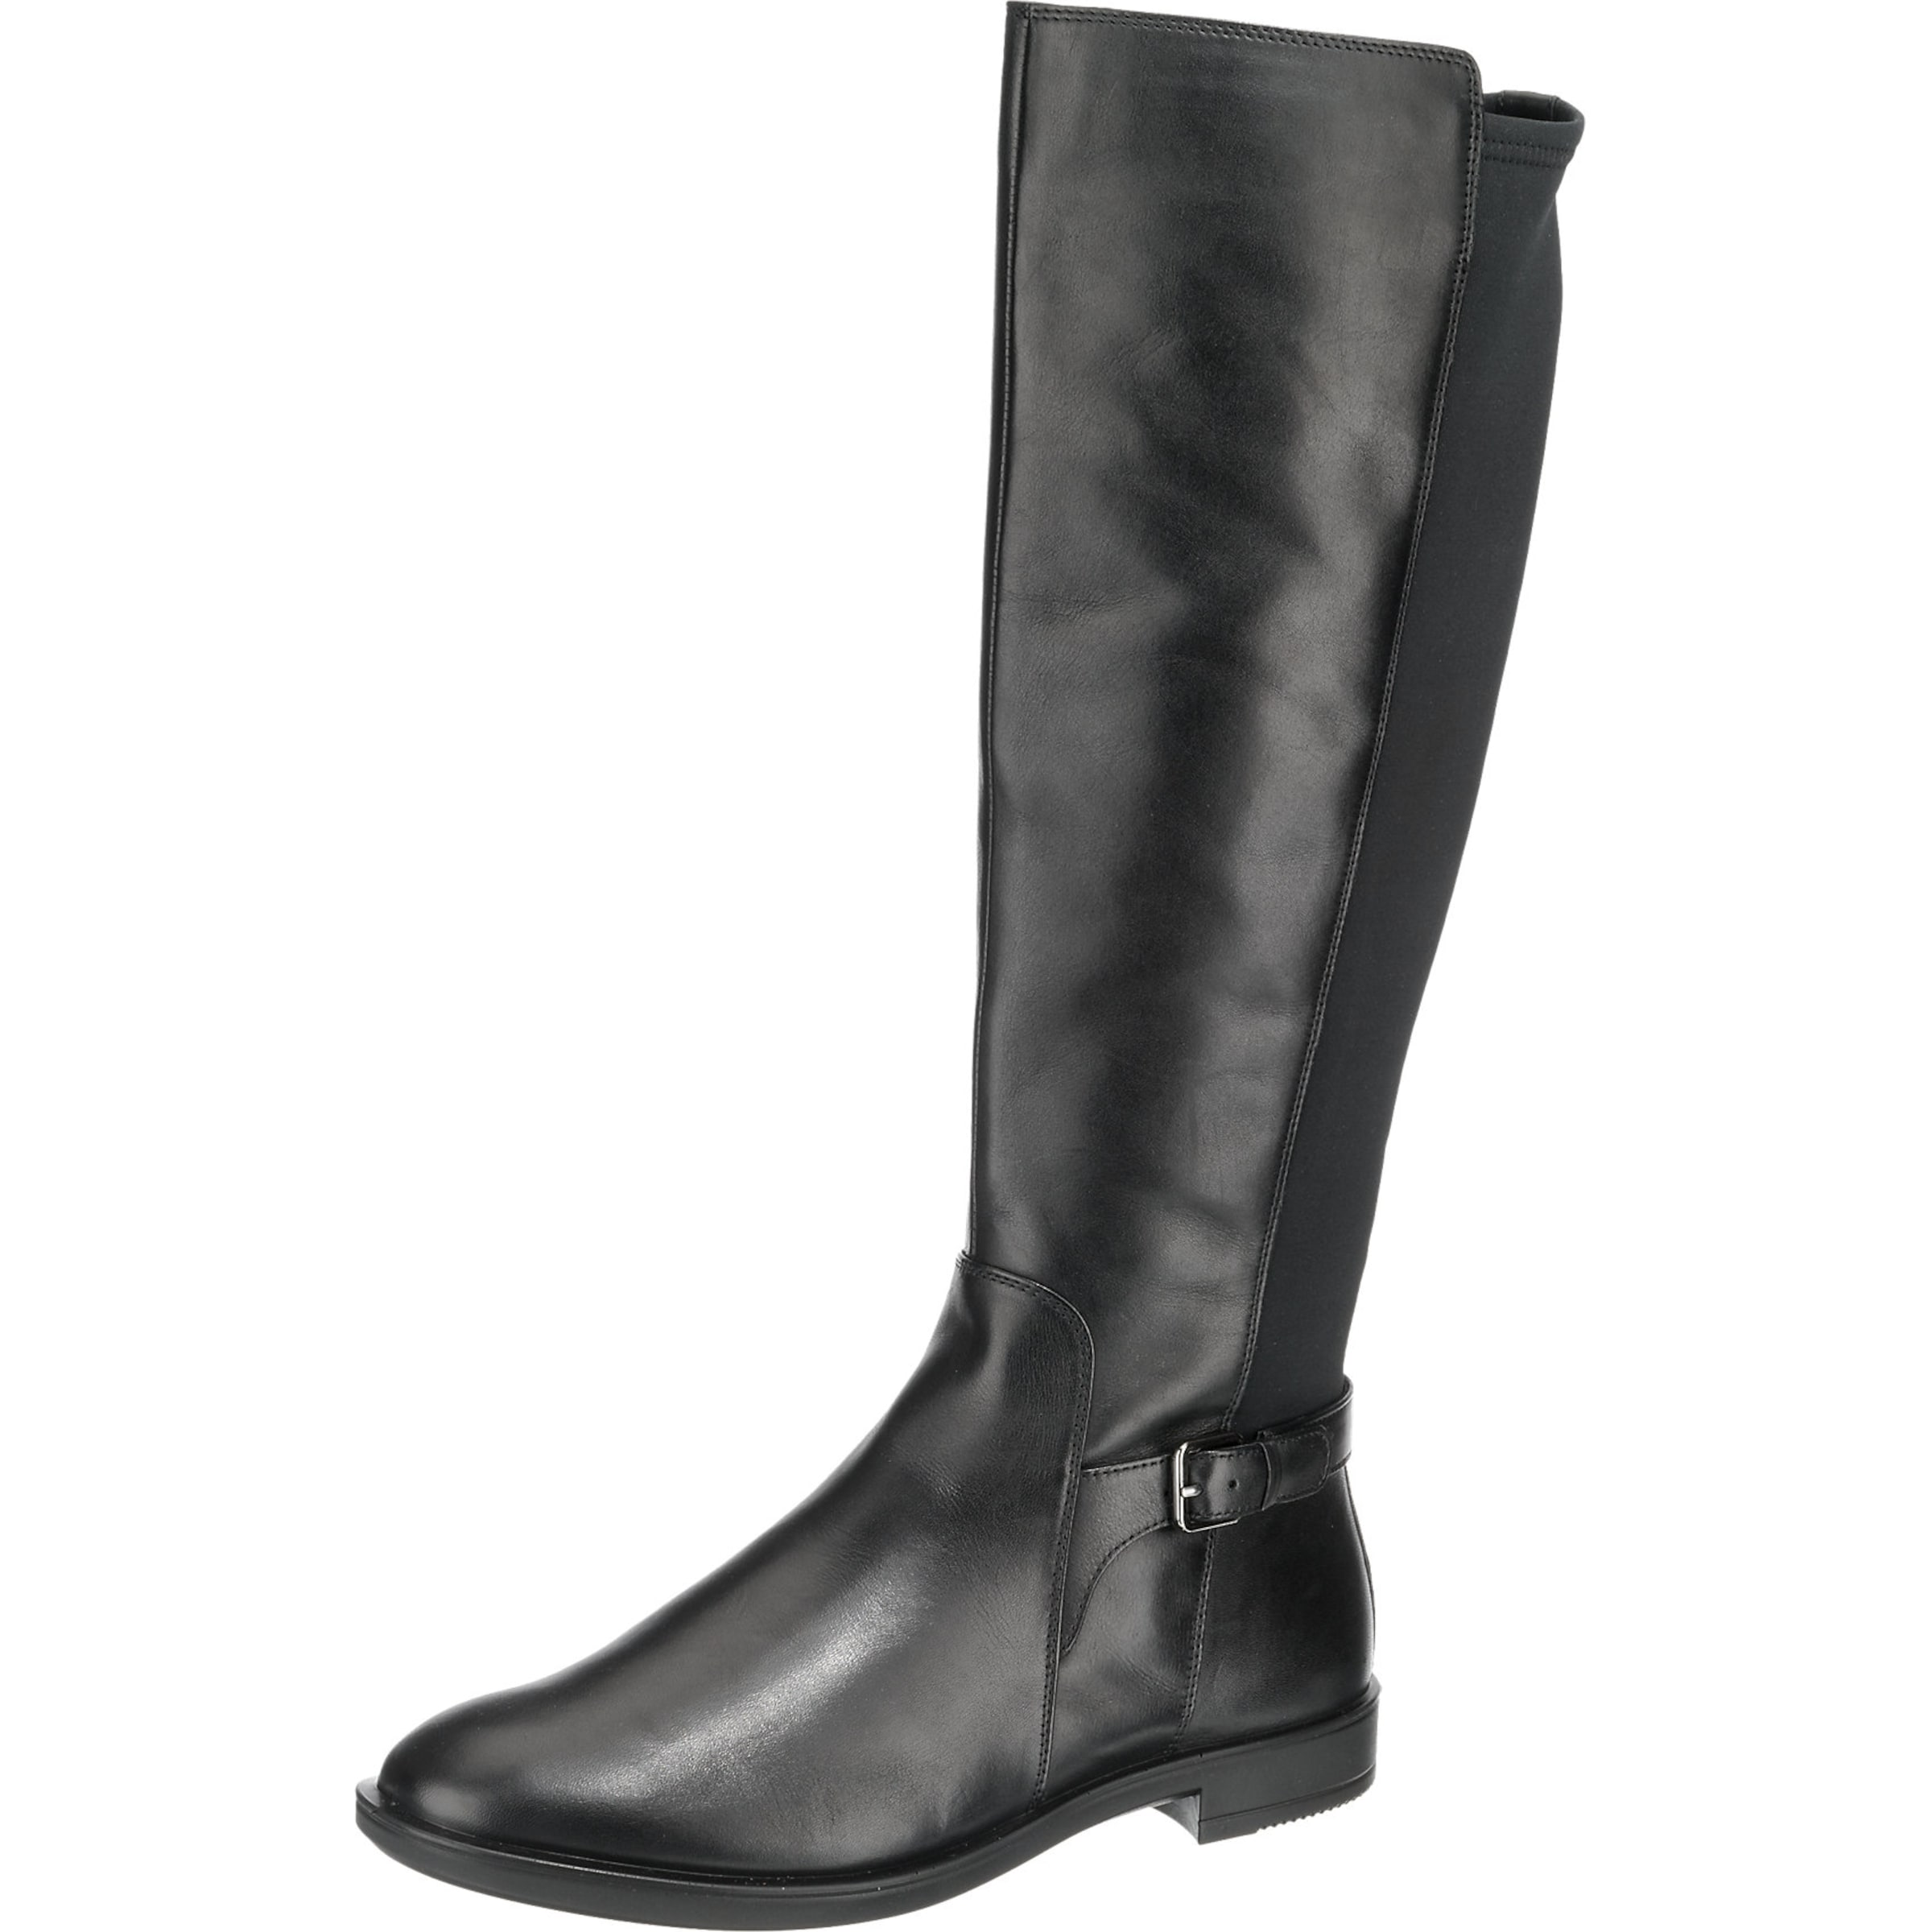 ECCO Shape M 15 Stiefel Hohe Qualität